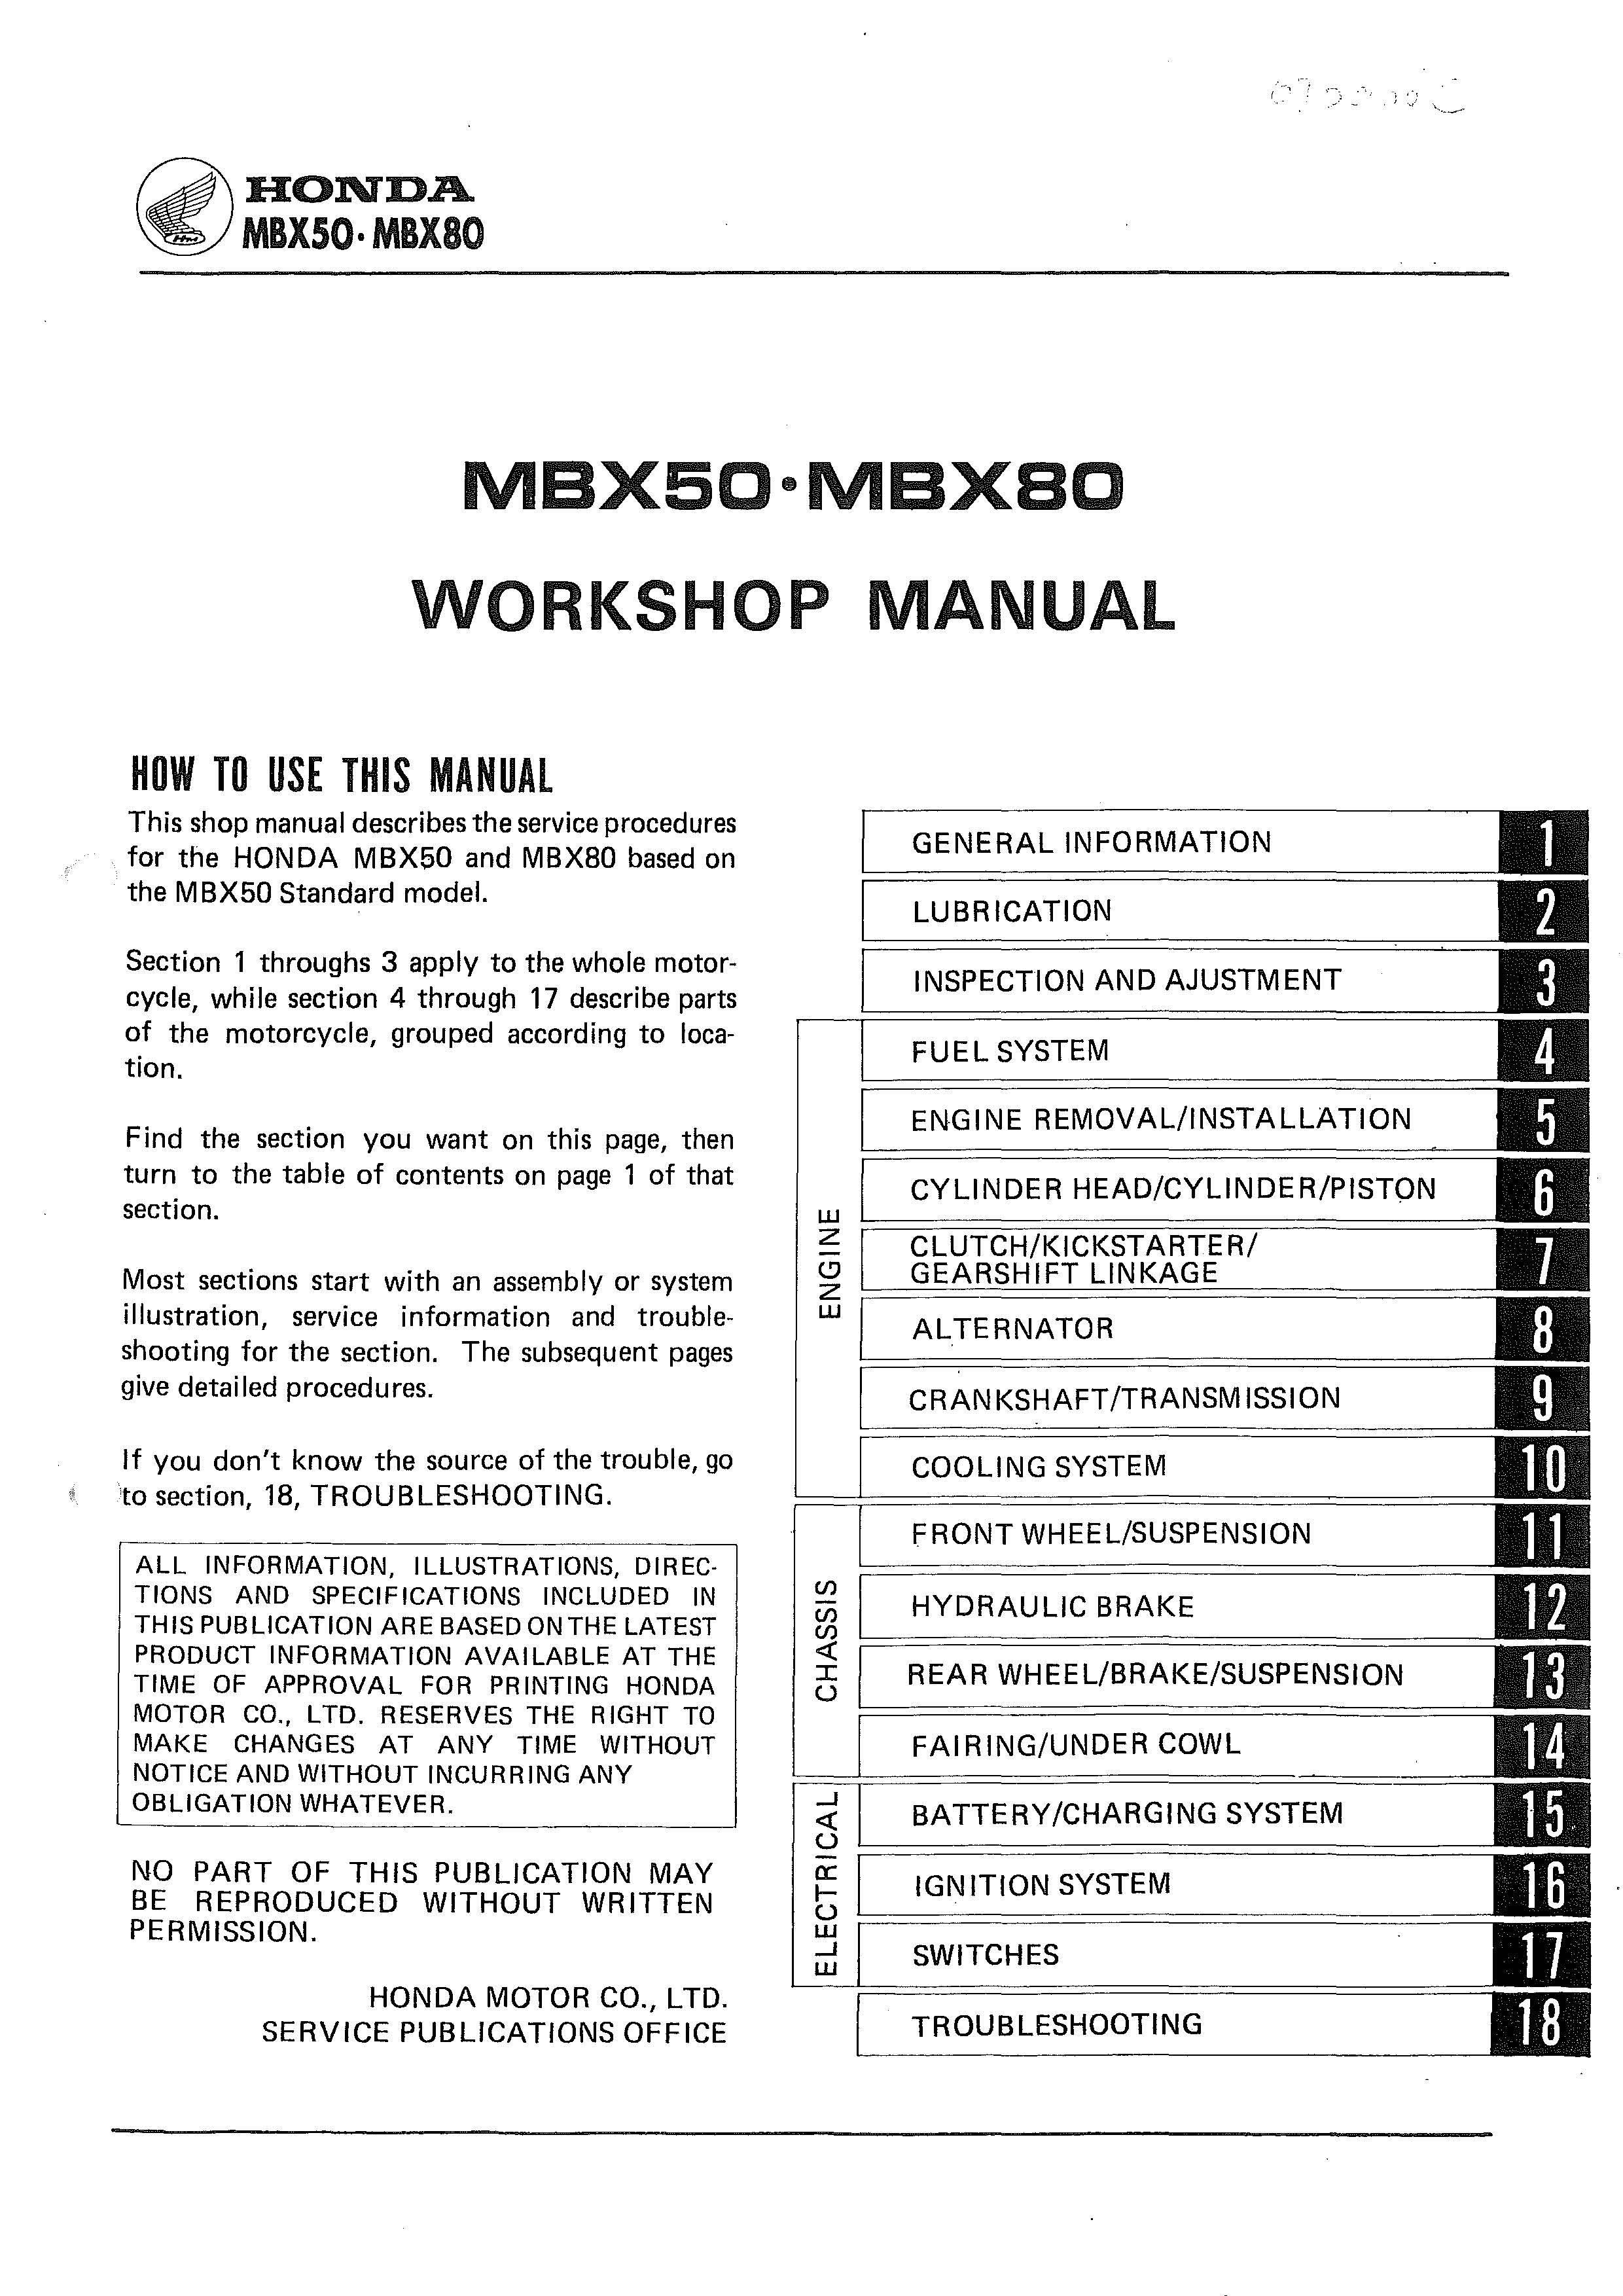 Workshop manual for Honda MBX80